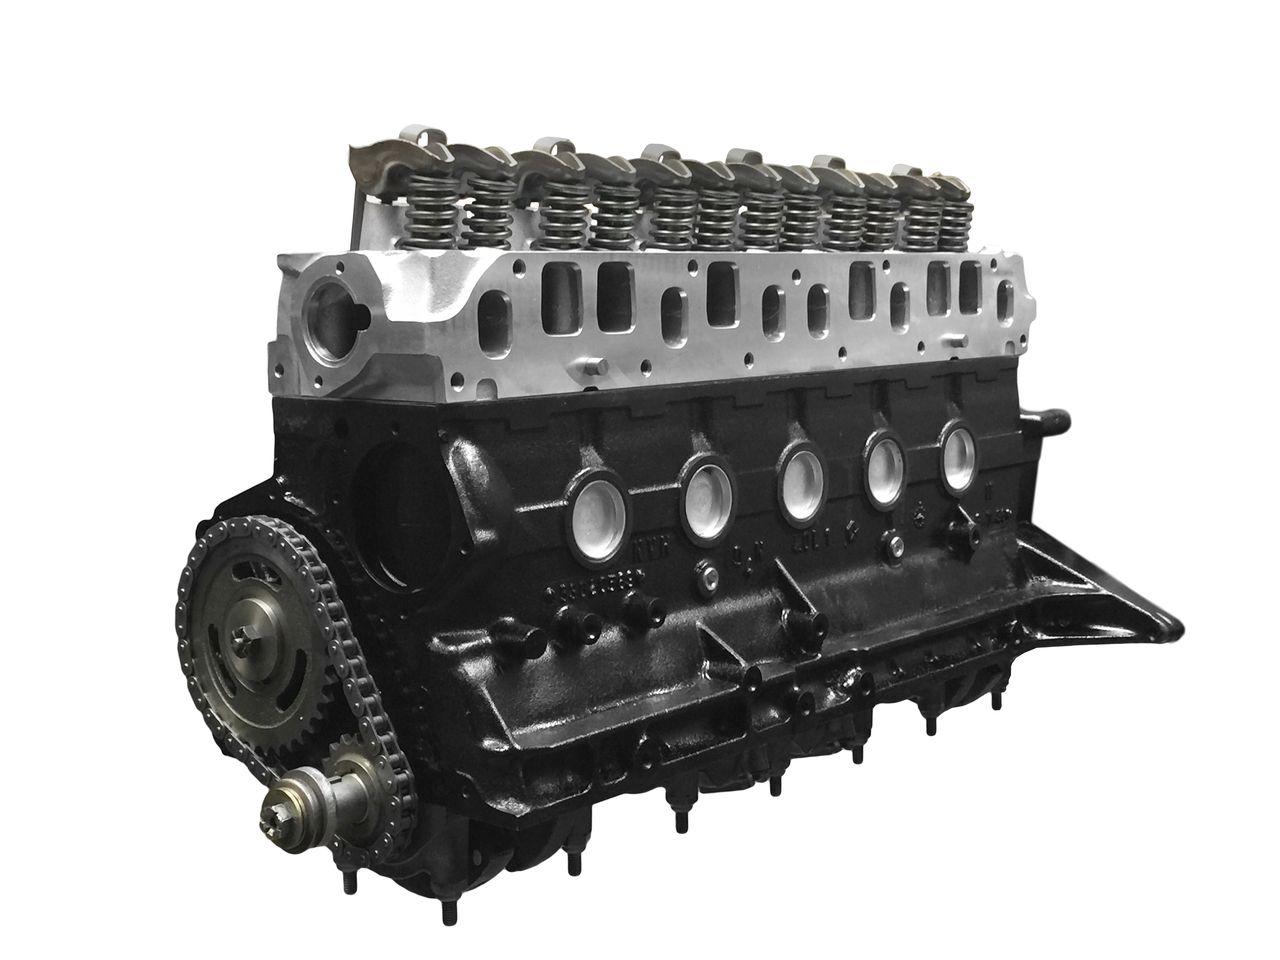 Titan Hyper 4 7 Jeep Stroker Engine W High Flow Edelbrock